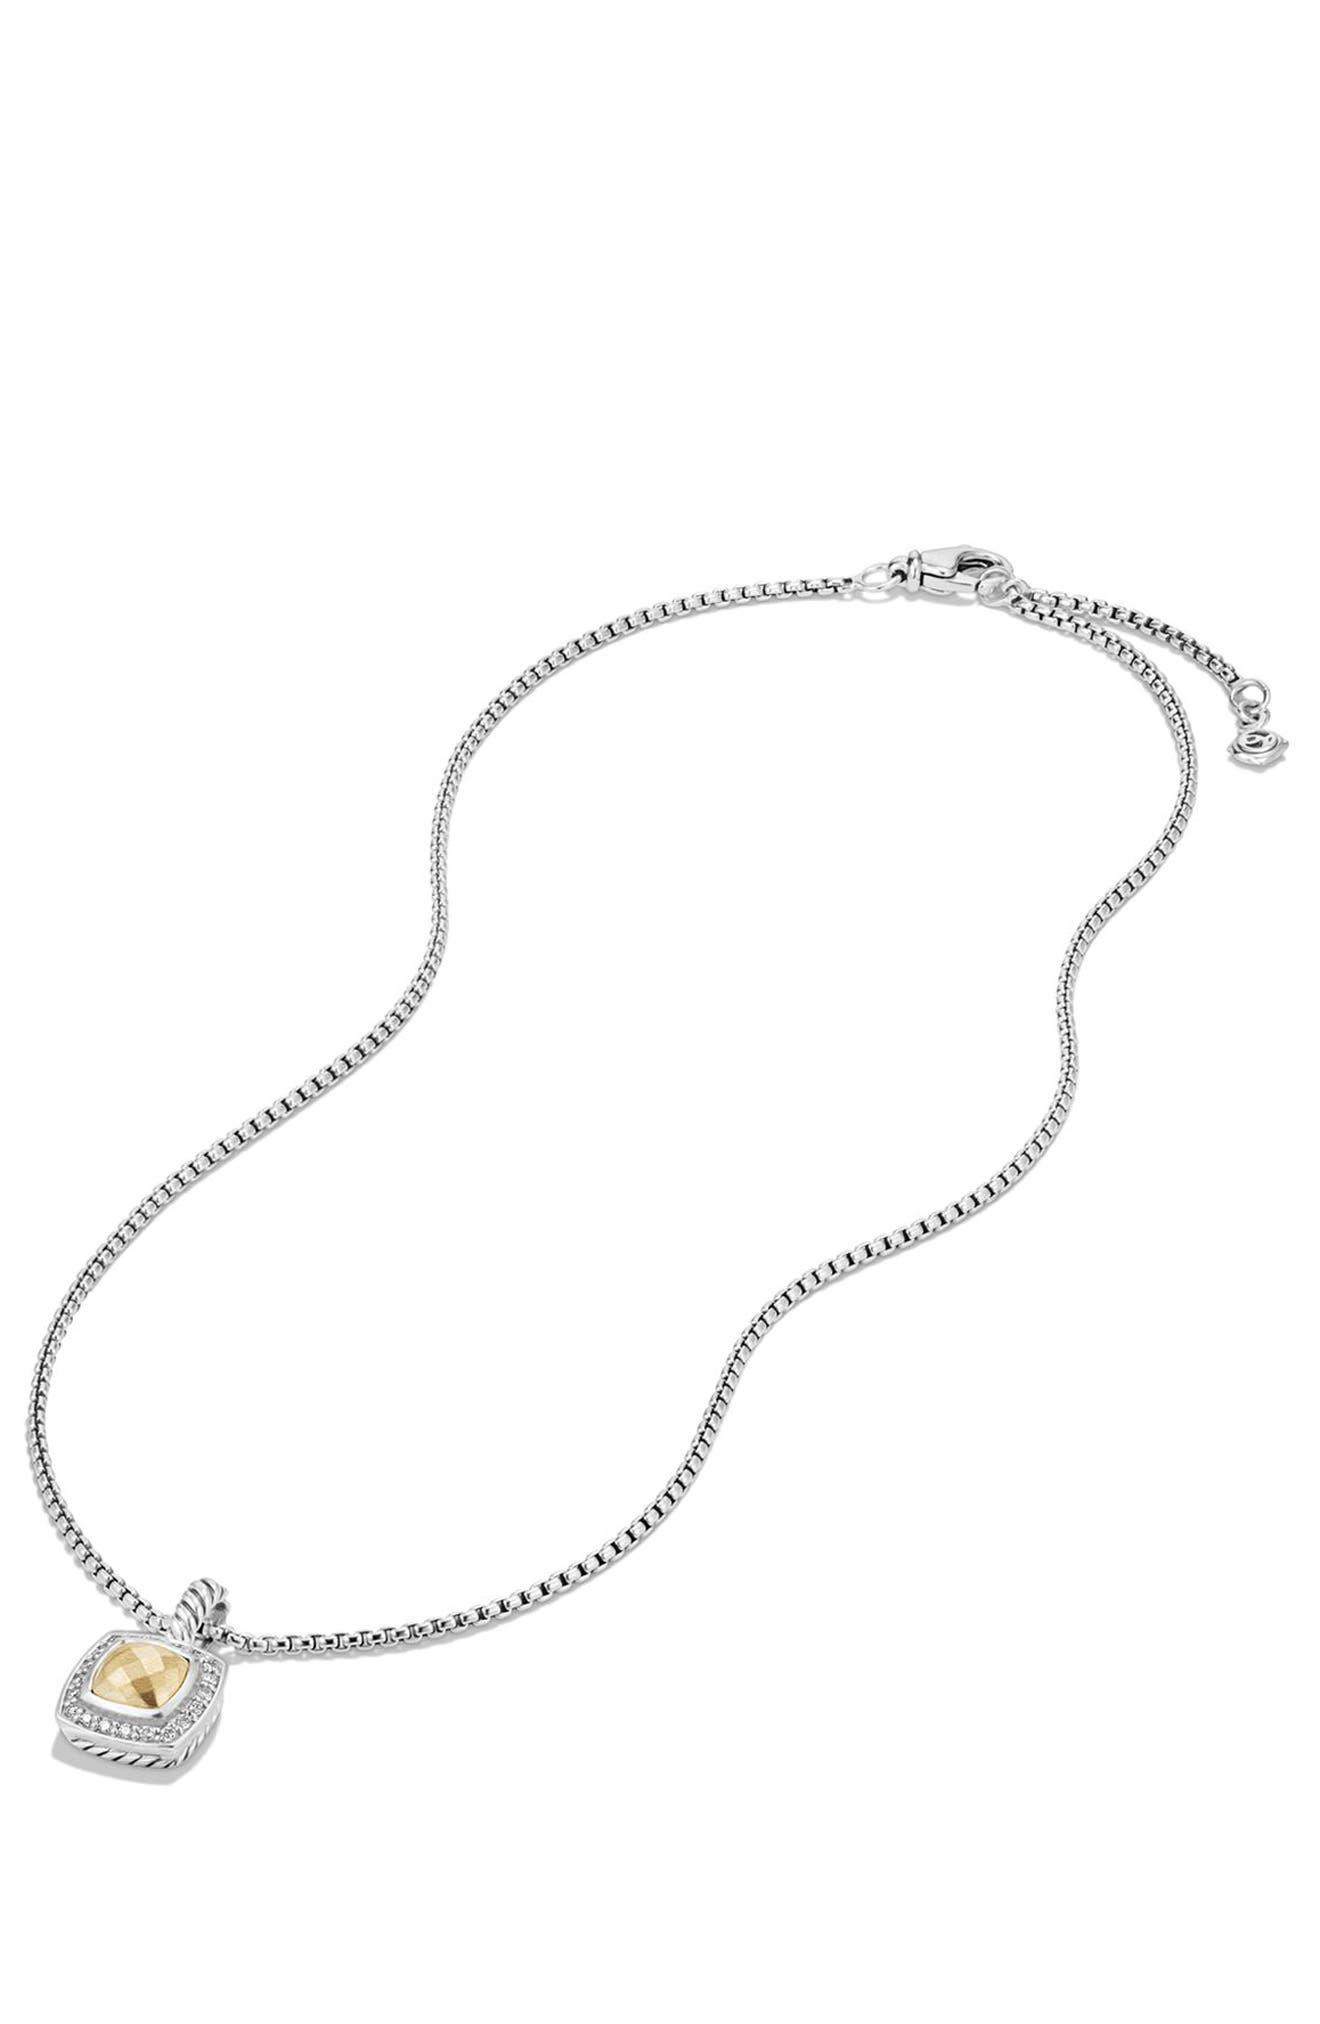 Petite Albion<sup>®</sup> Pendant Necklace with Diamonds,                             Alternate thumbnail 3, color,                             SILVER/ GOLD